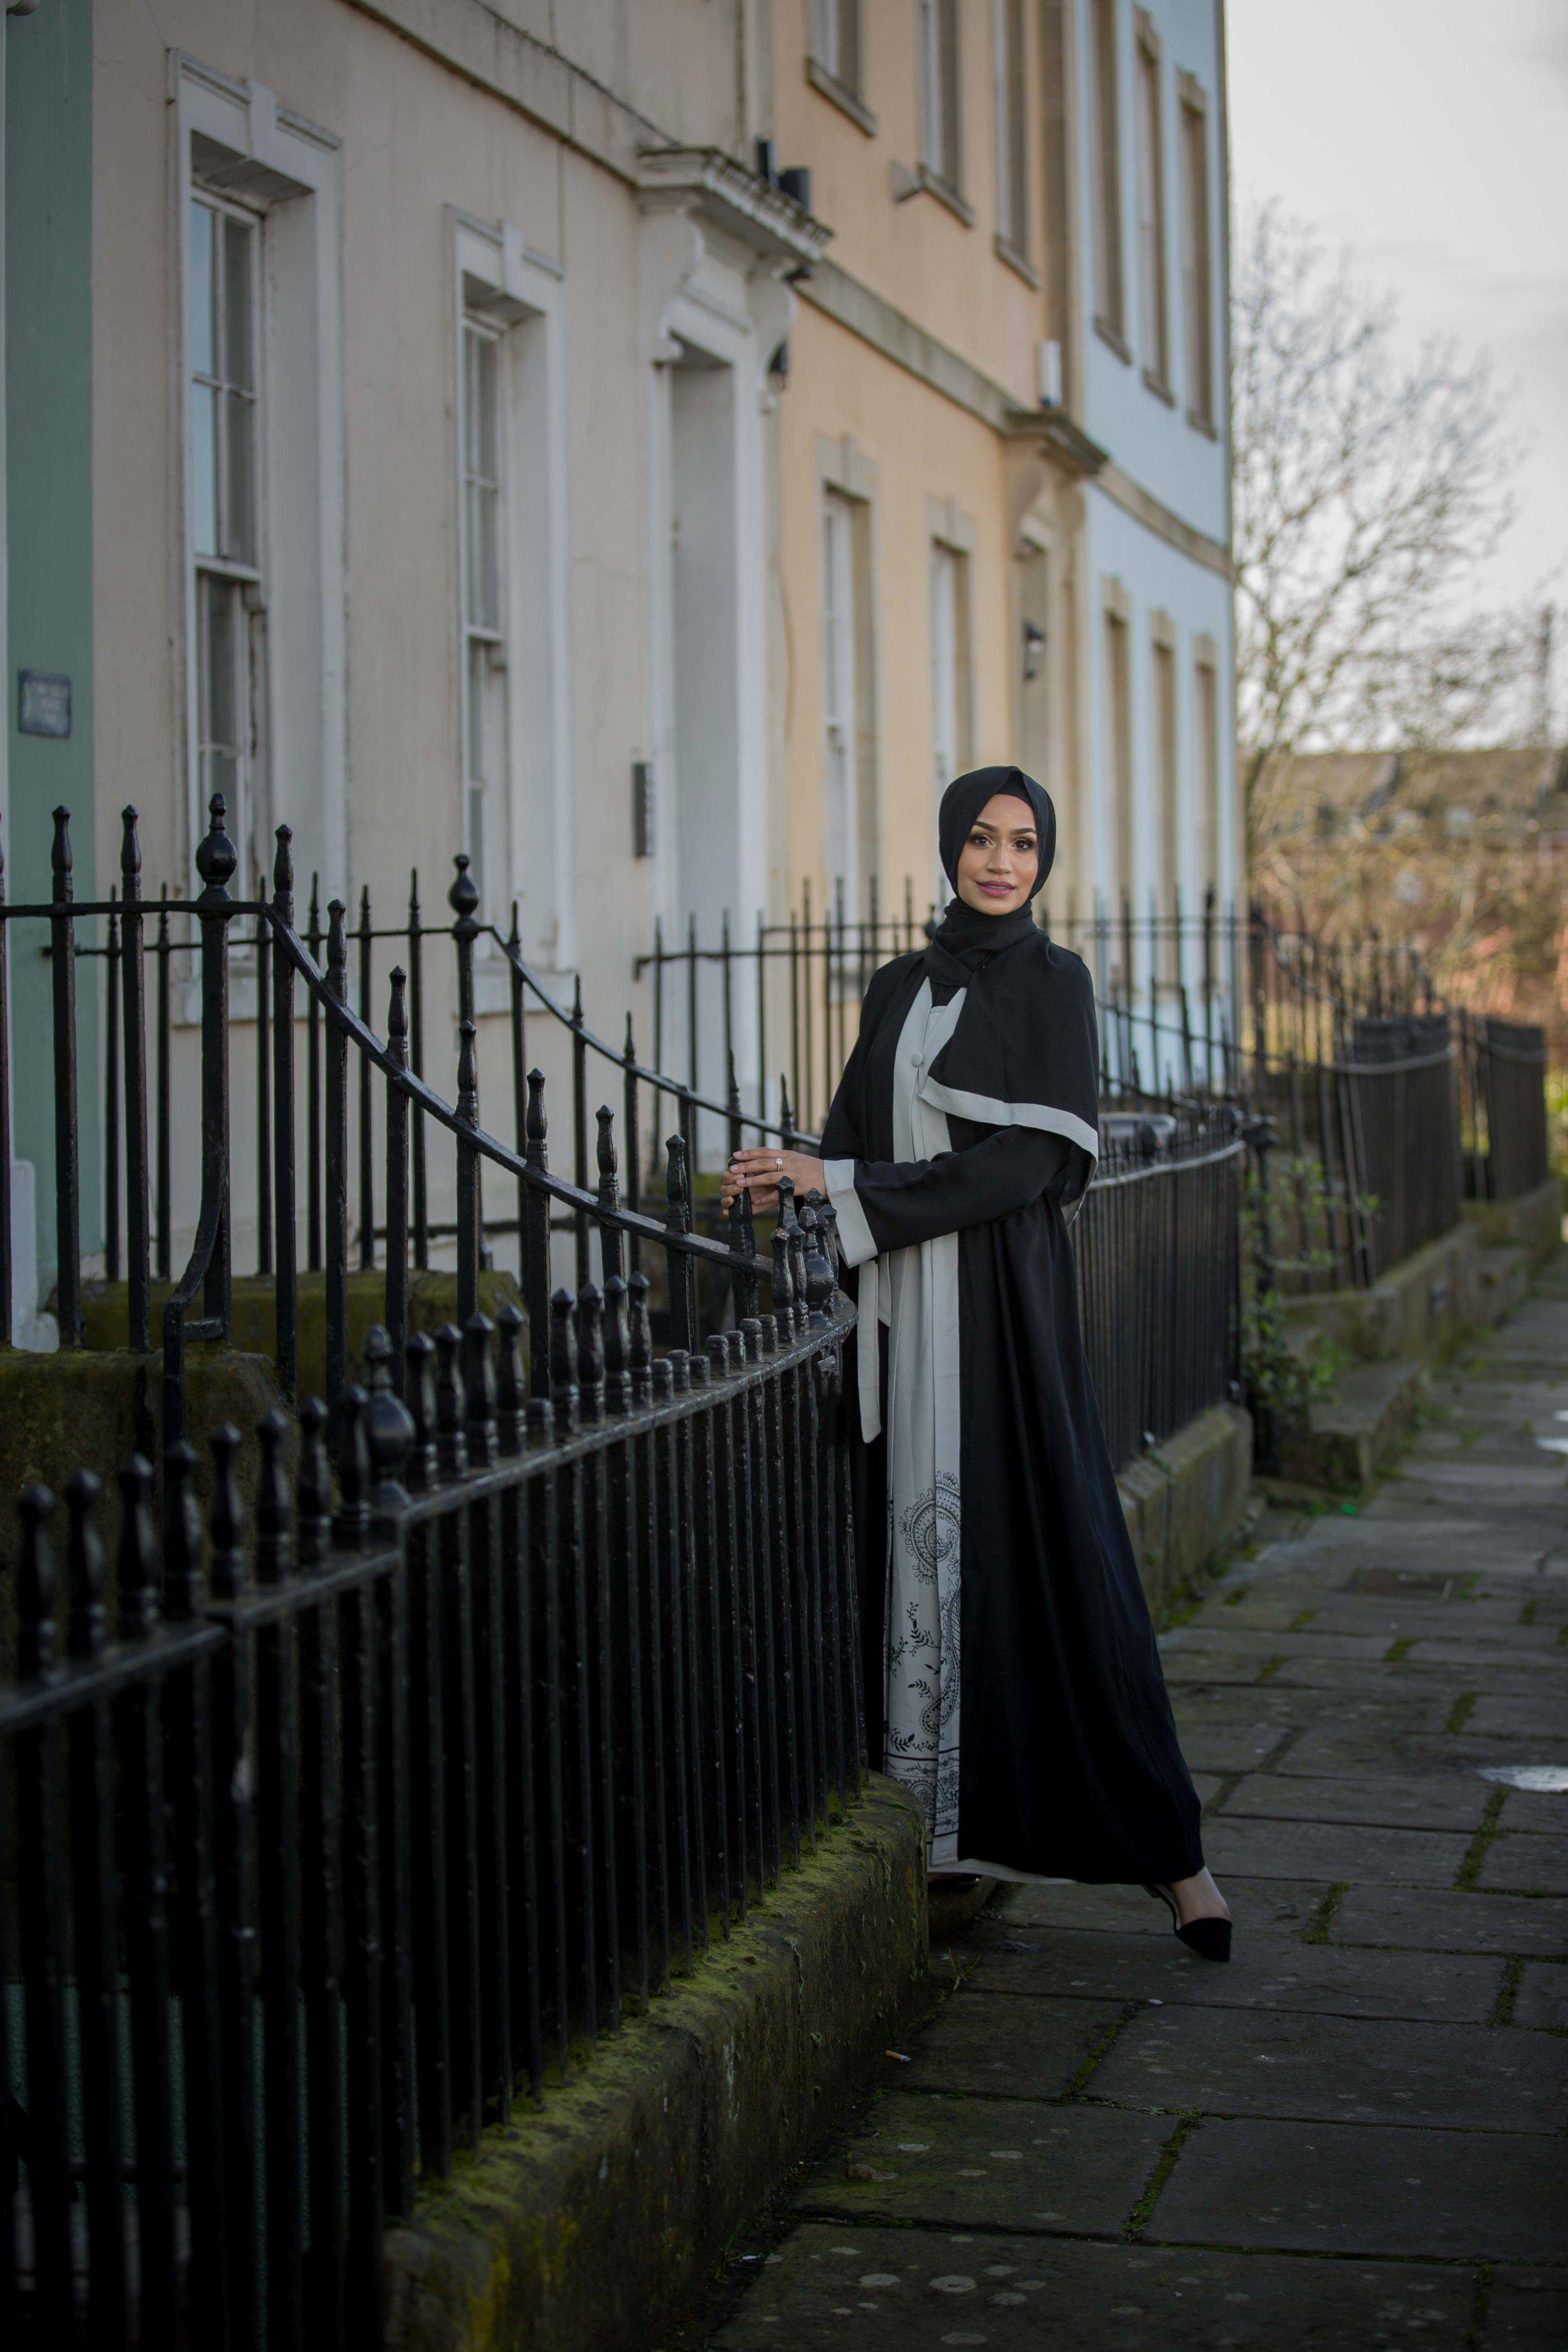 modest-street-aisha-rahman-fashion-photography-london-bristol-natalia-smith-photography-5.jpg